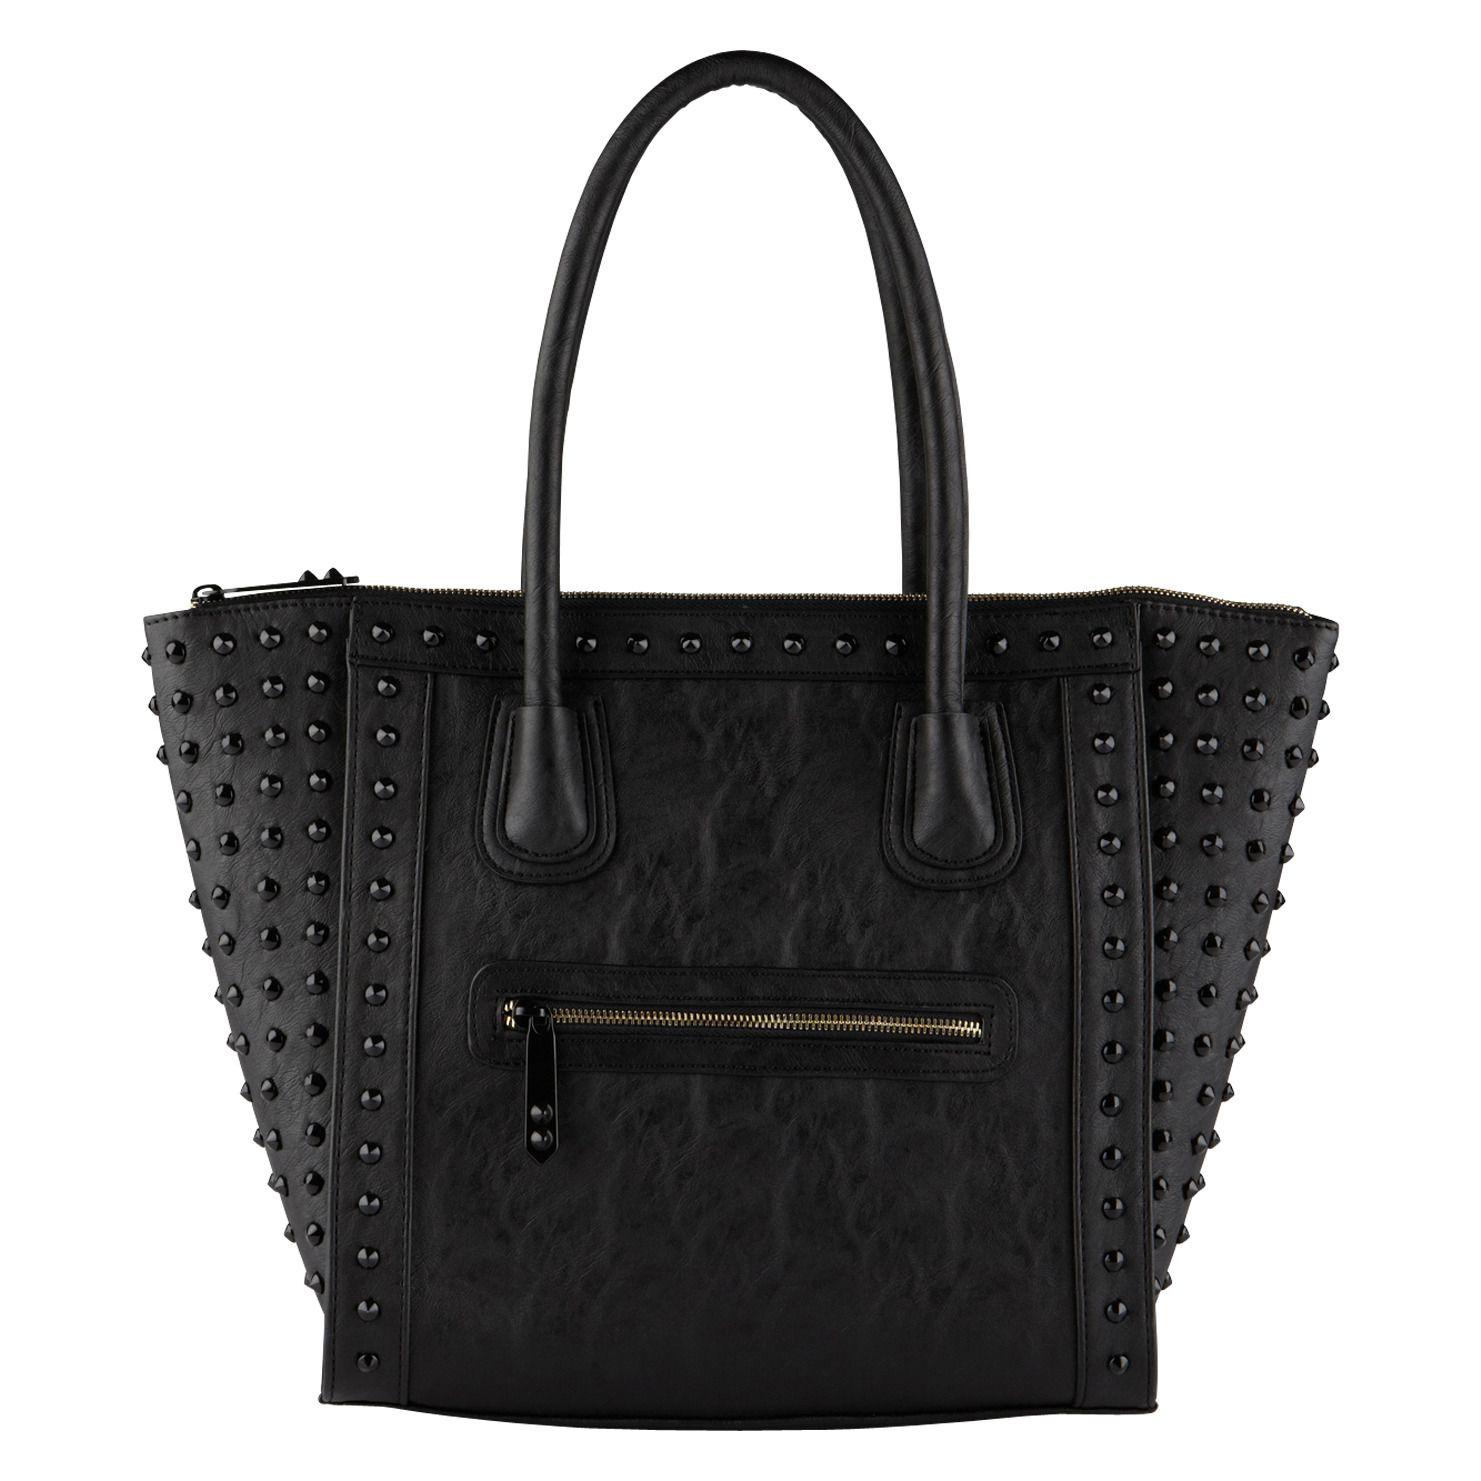 FOLORTAN - handbags s satchels   handheld bags for sale at ALDO Shoes. Bolsas  Femininas a7ac0ee5cd7